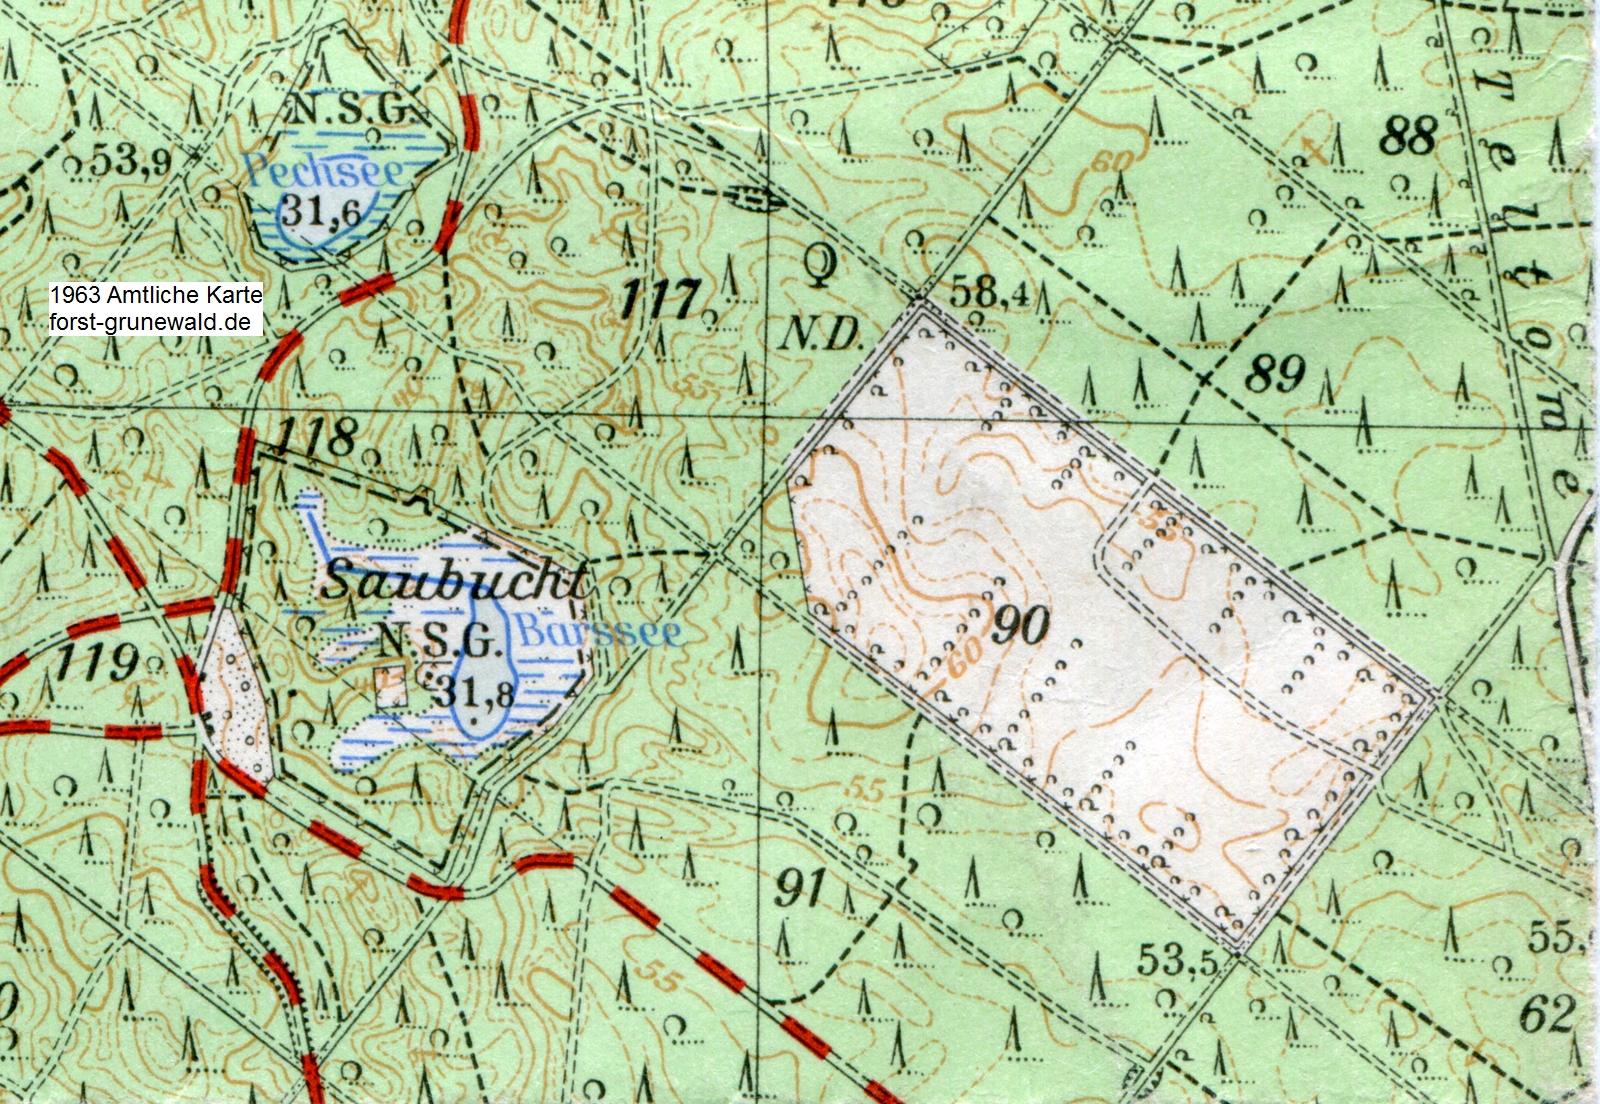 swingerclub in radolfzell jagen 90 grunewald